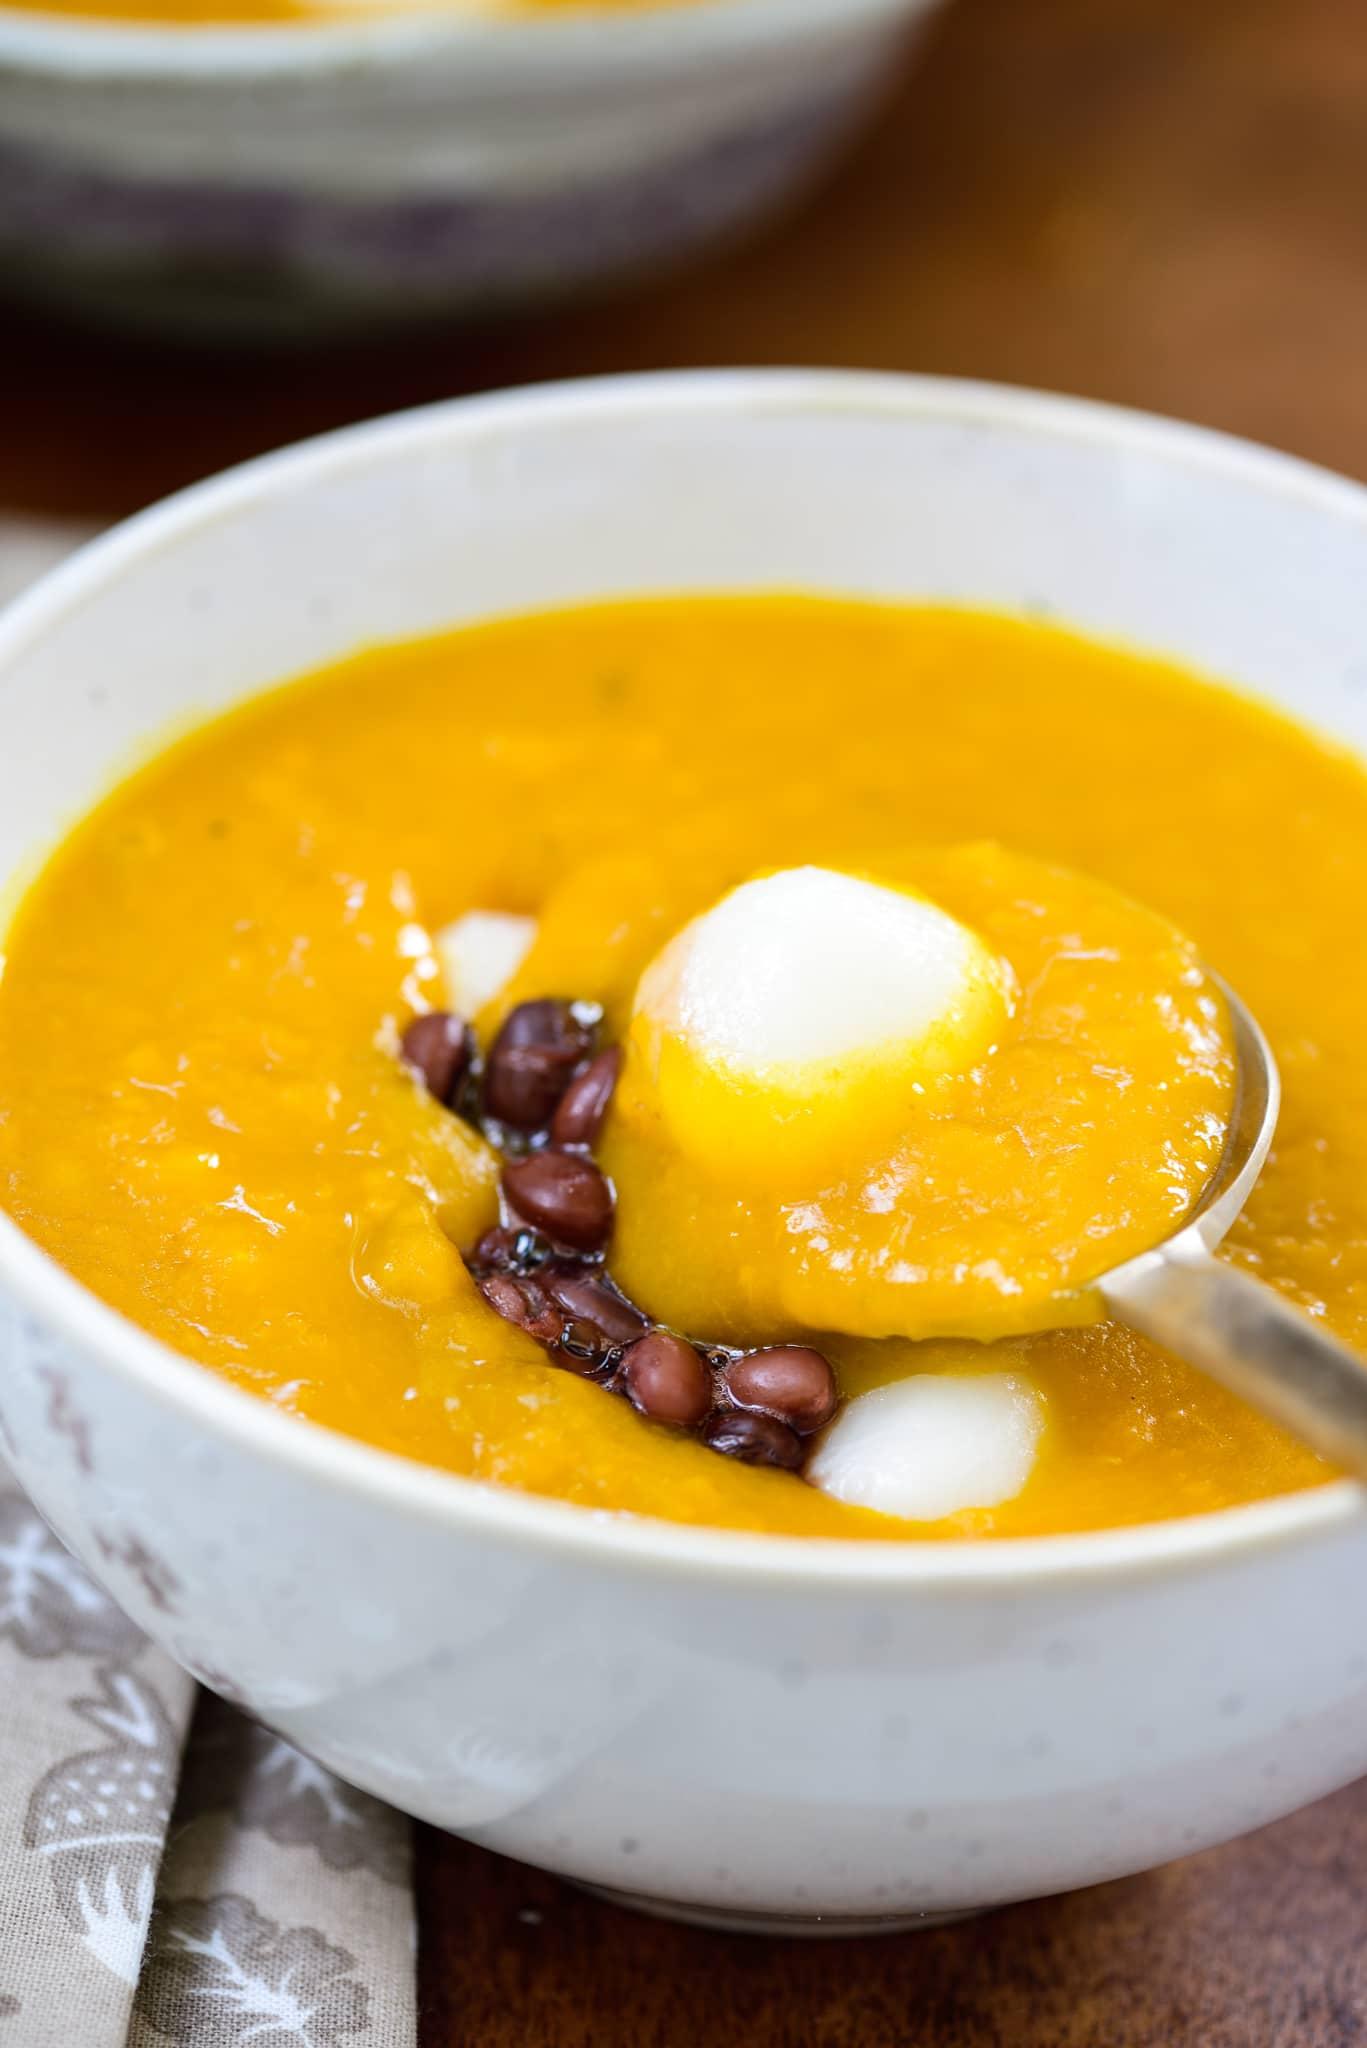 DSC4523 2 - Hobakjuk (Pumpkin Porridge)